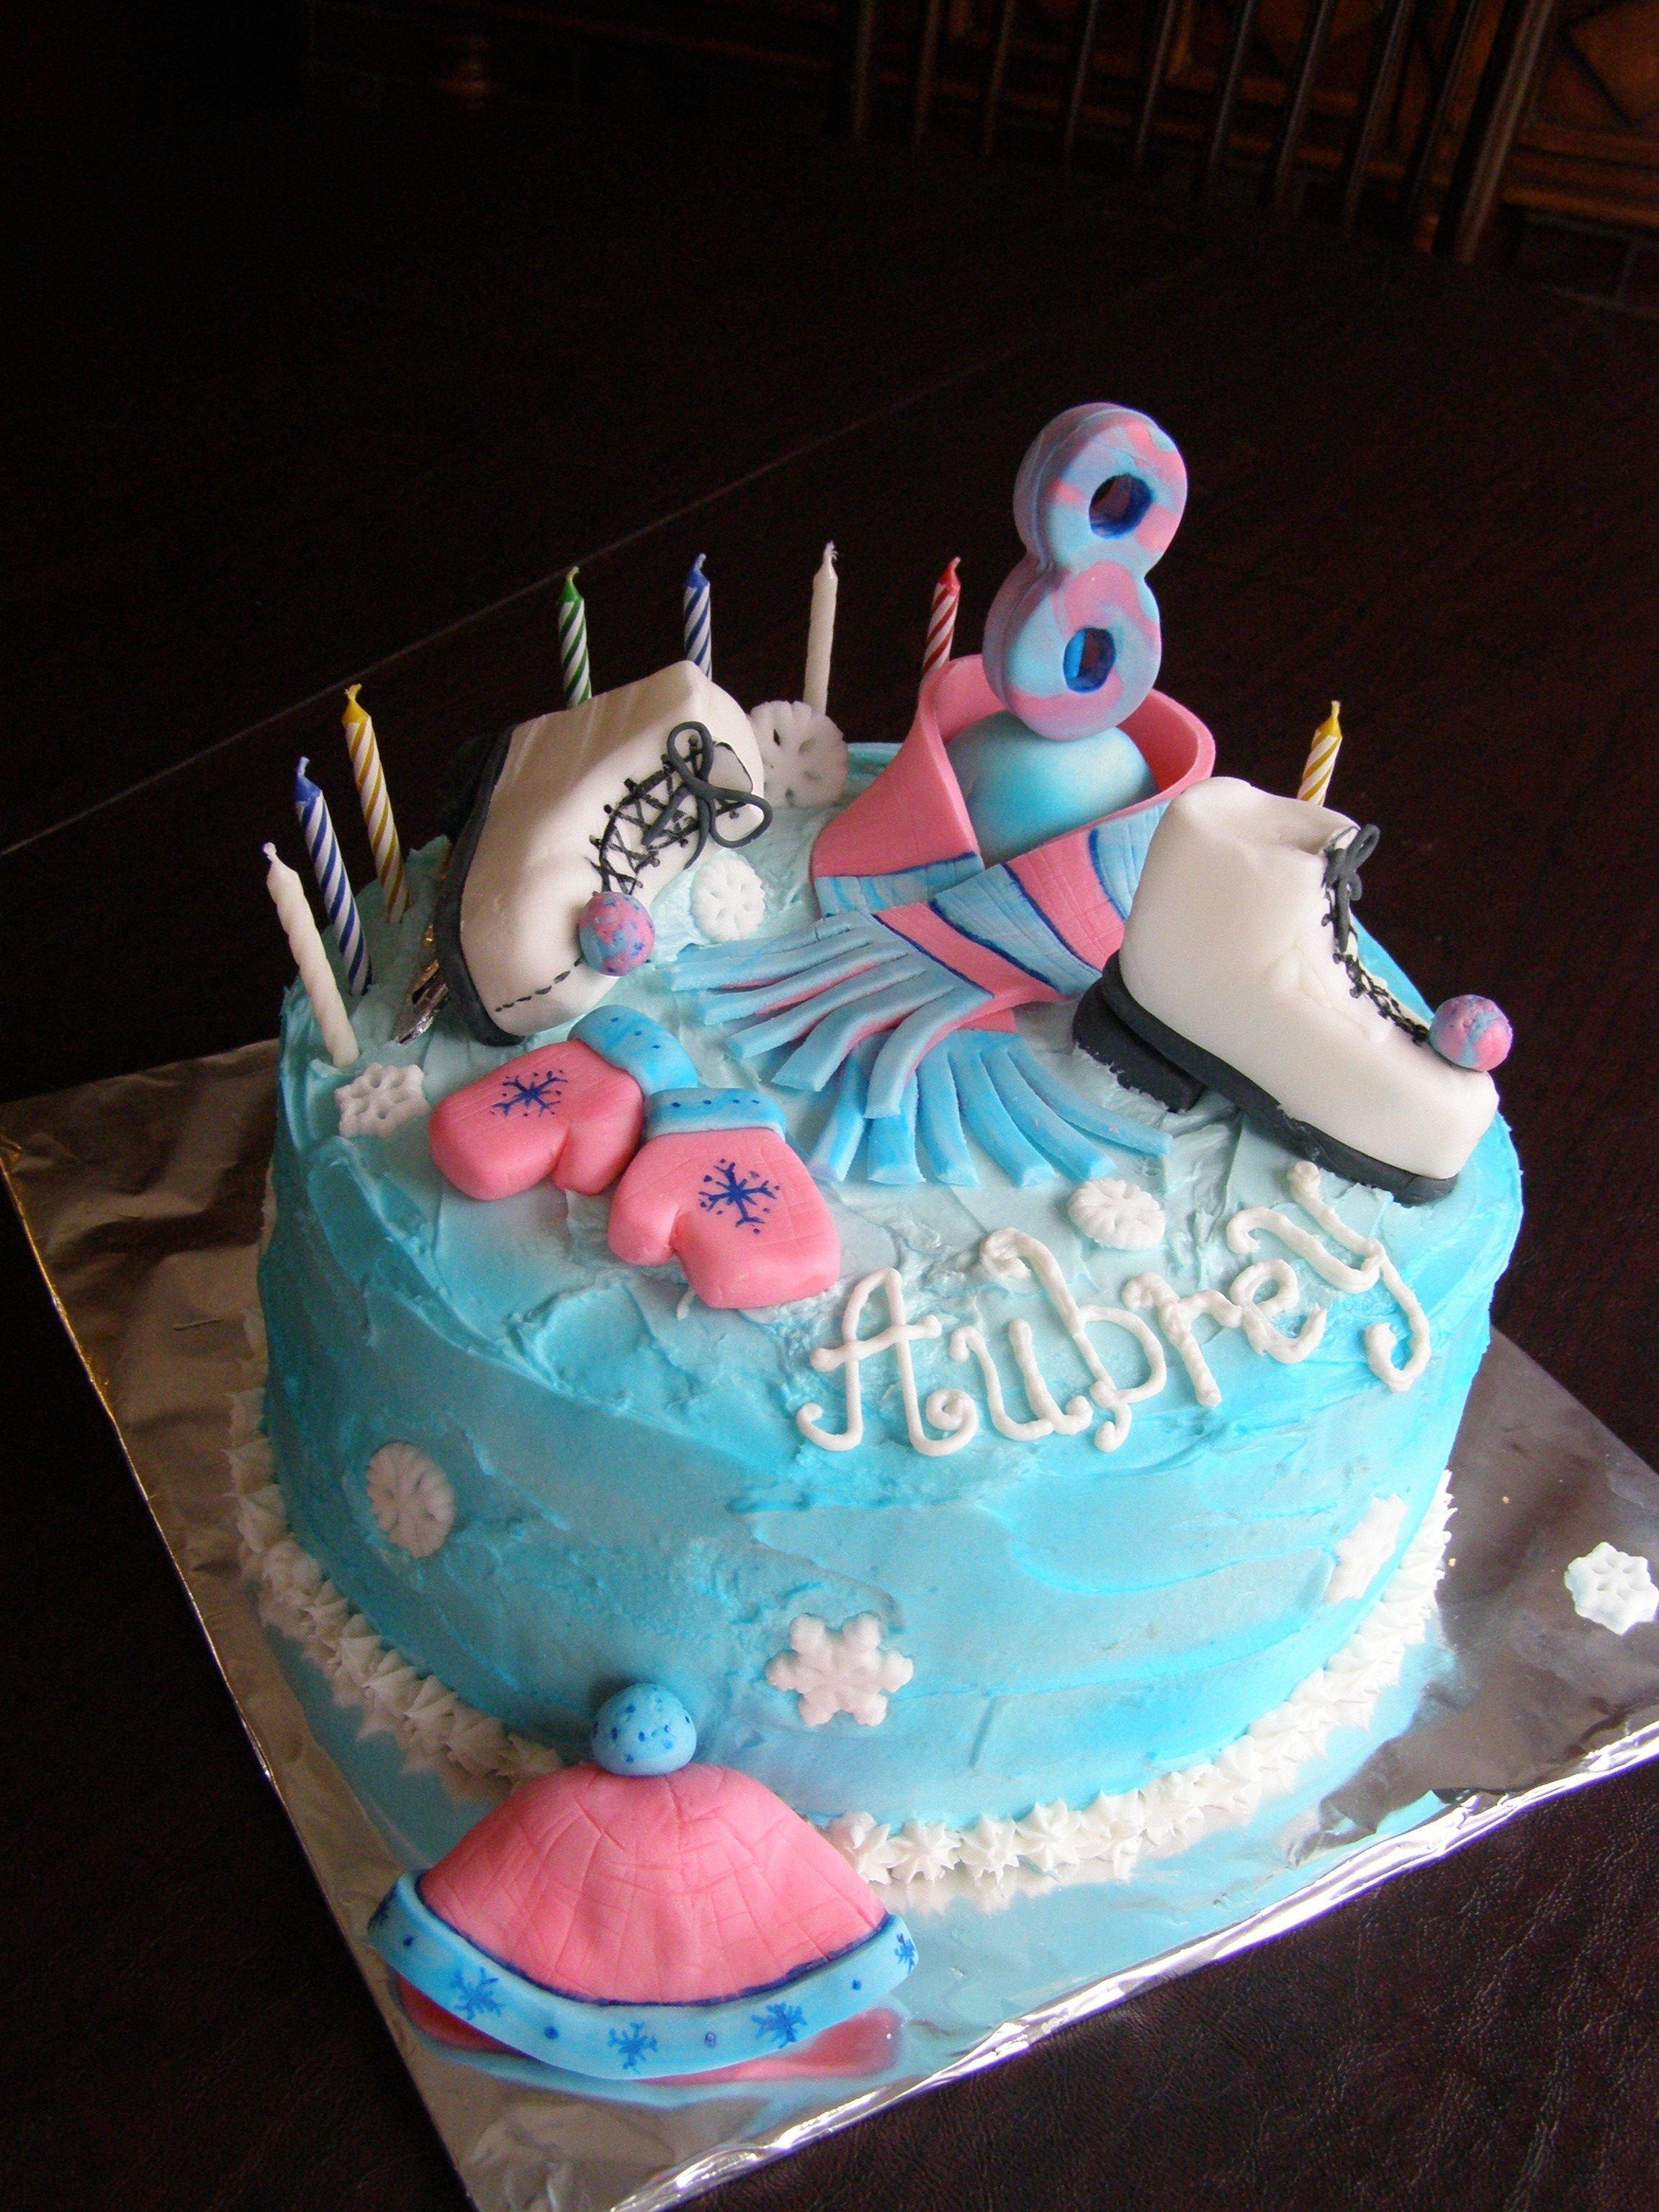 10 Fashionable Ice Skating Birthday Party Ideas ice skating birthday party cake cakes ive decorated pinterest